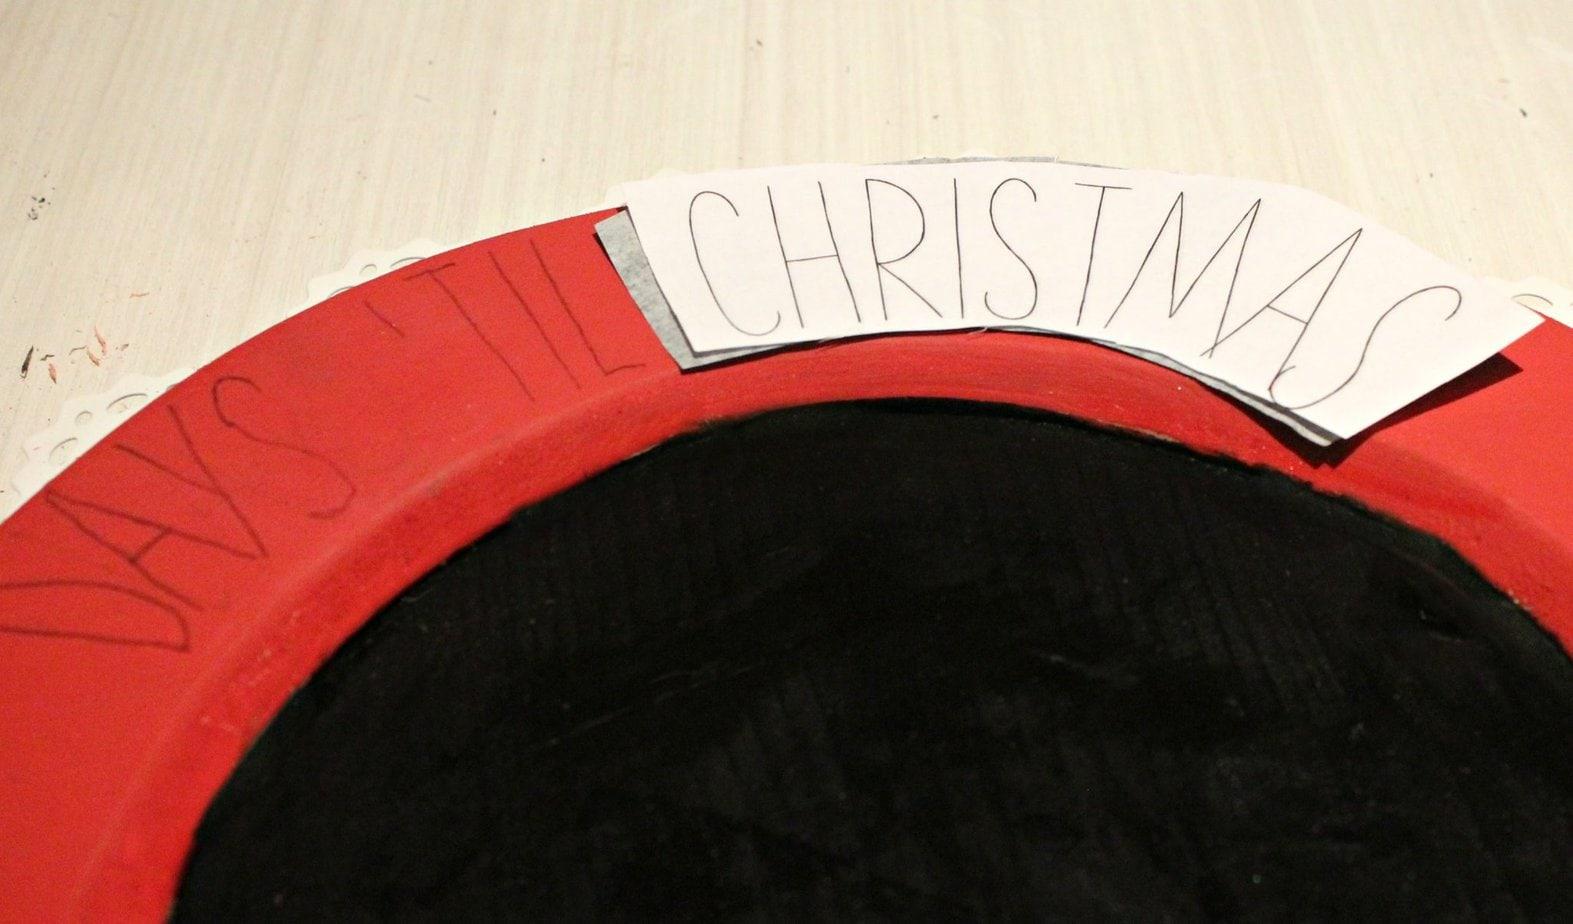 DIY Countdown Calendar transfering days 'til Christmas lettering.